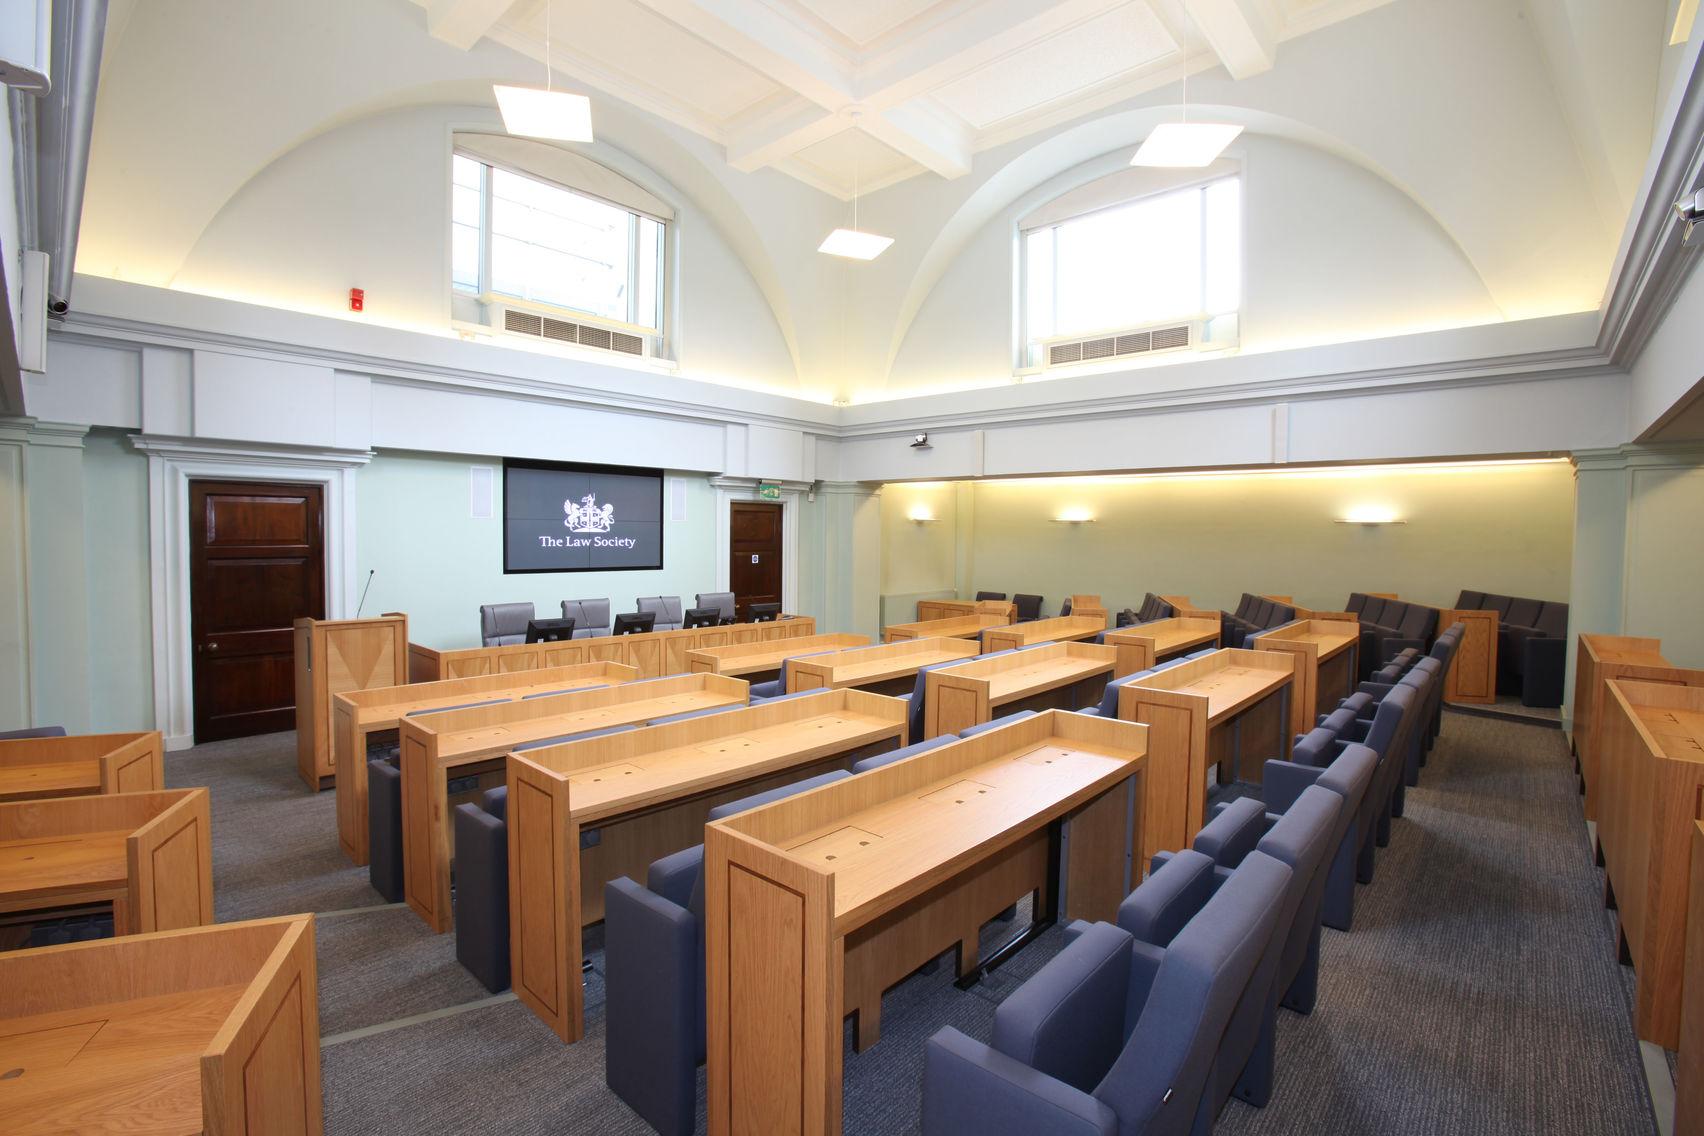 Council Chamber, 113 Chancery Lane